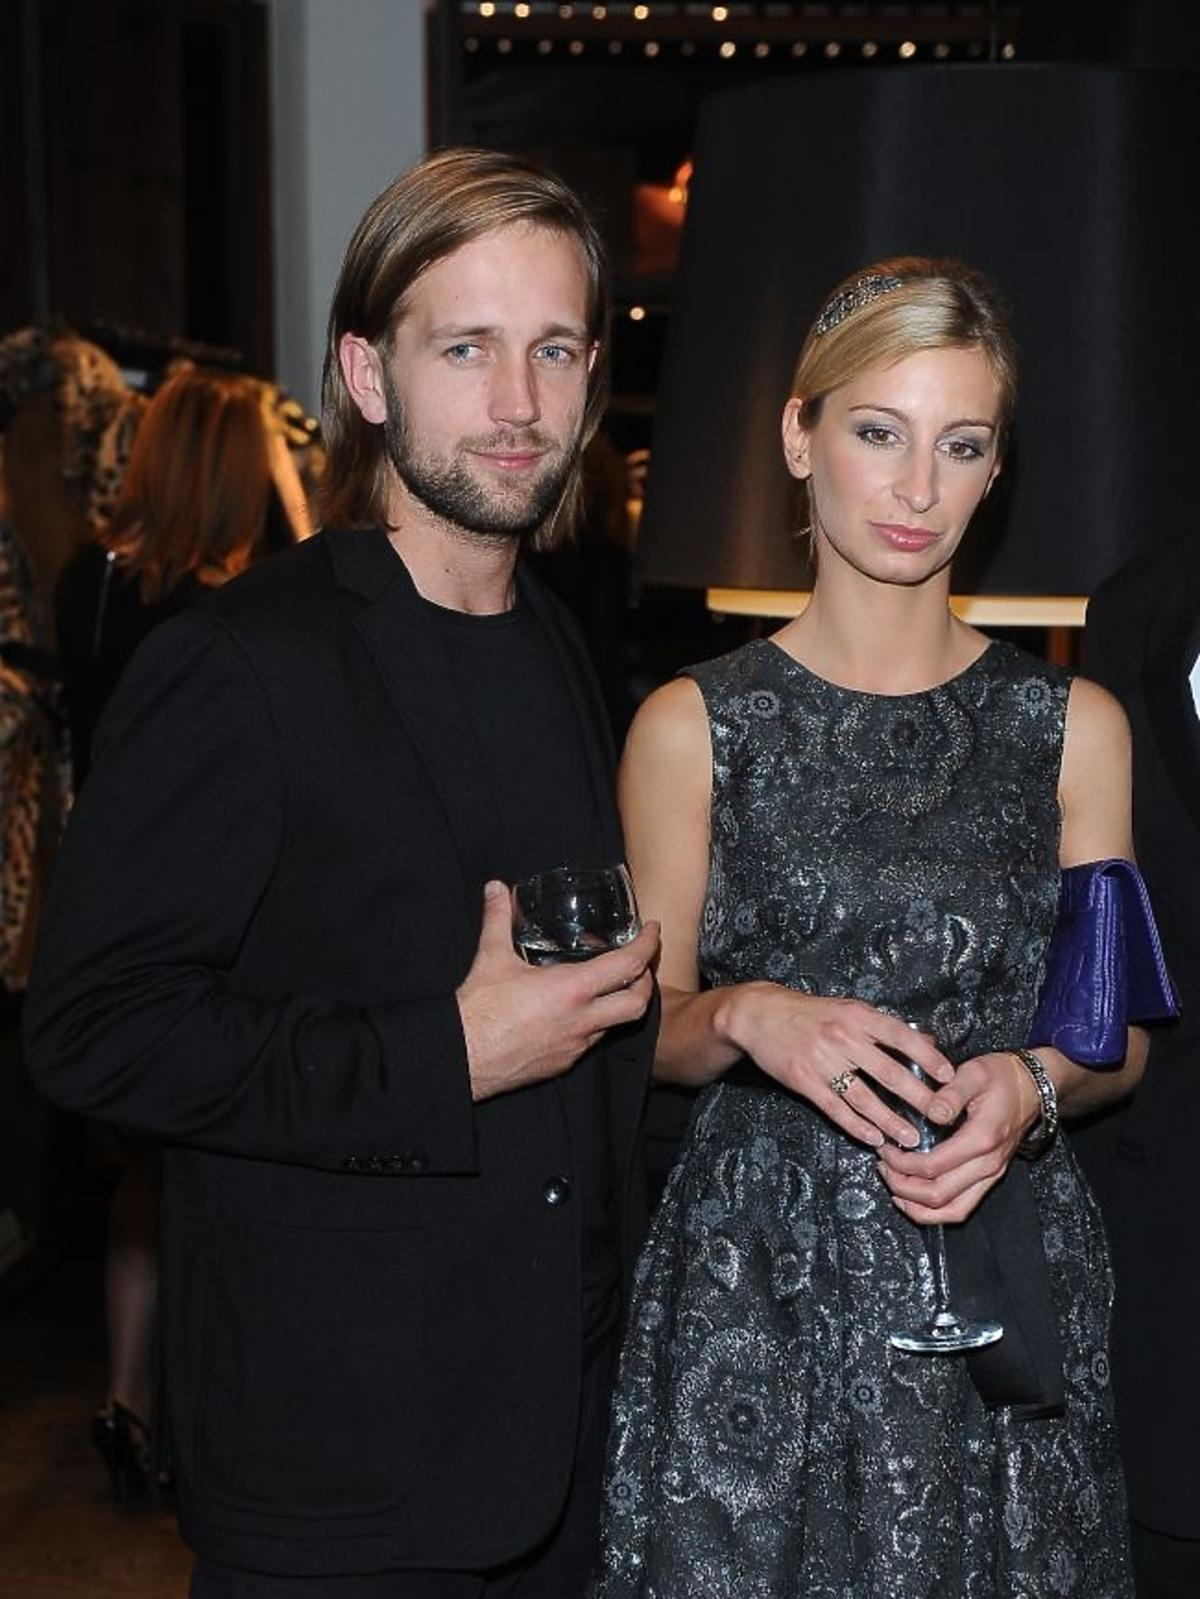 Magdalena Schejbal z partnerem na otwrciu butiku Caroliny Herrery w Zakopanem